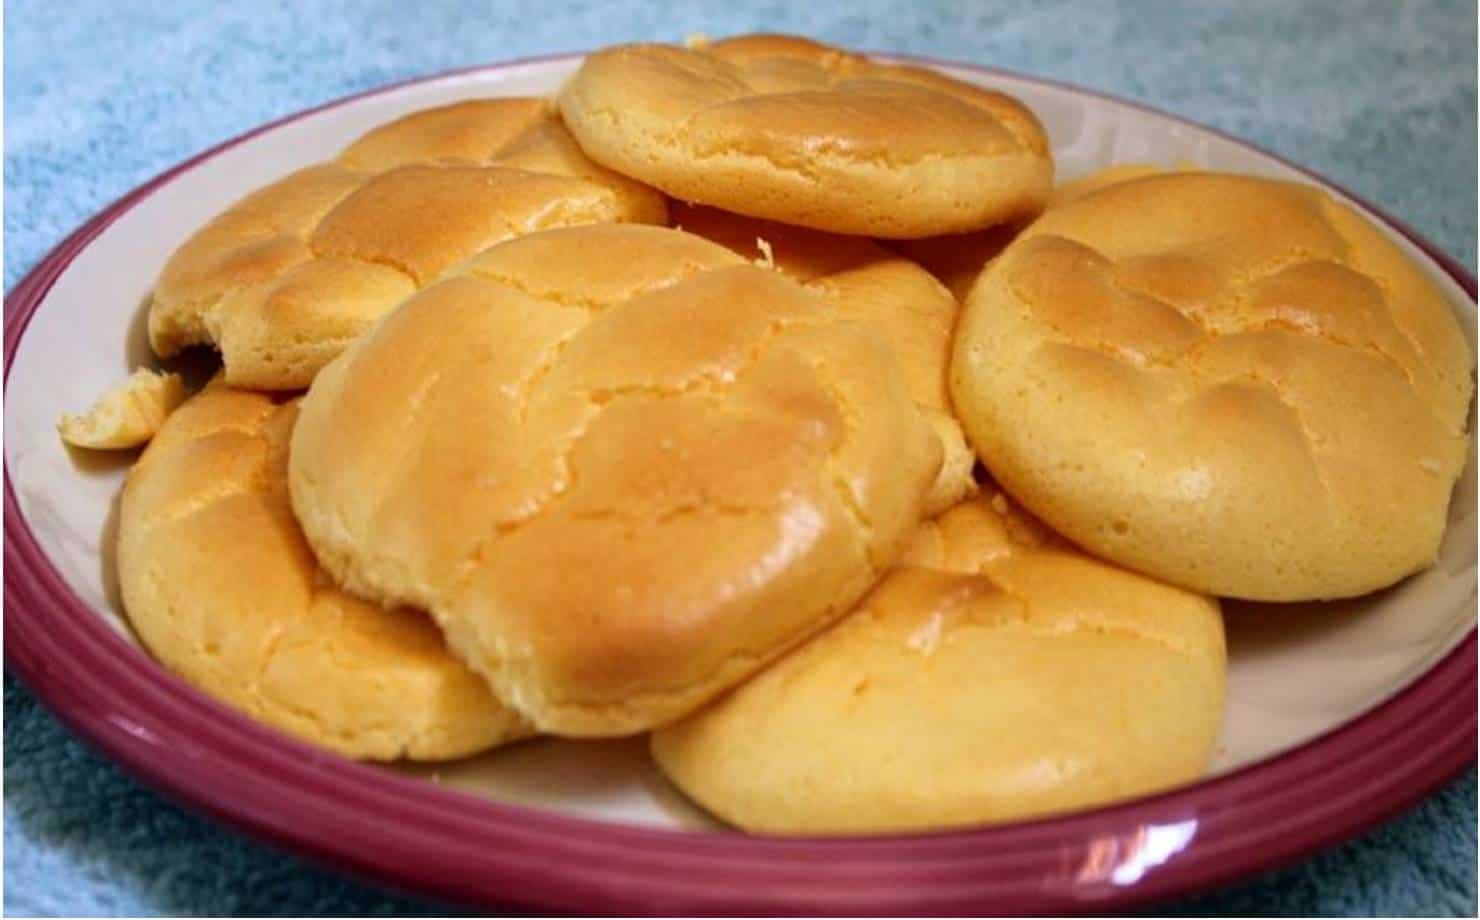 Delicia fit: desfrute de um delicioso pão nuvem com apenas 3 ingredientes